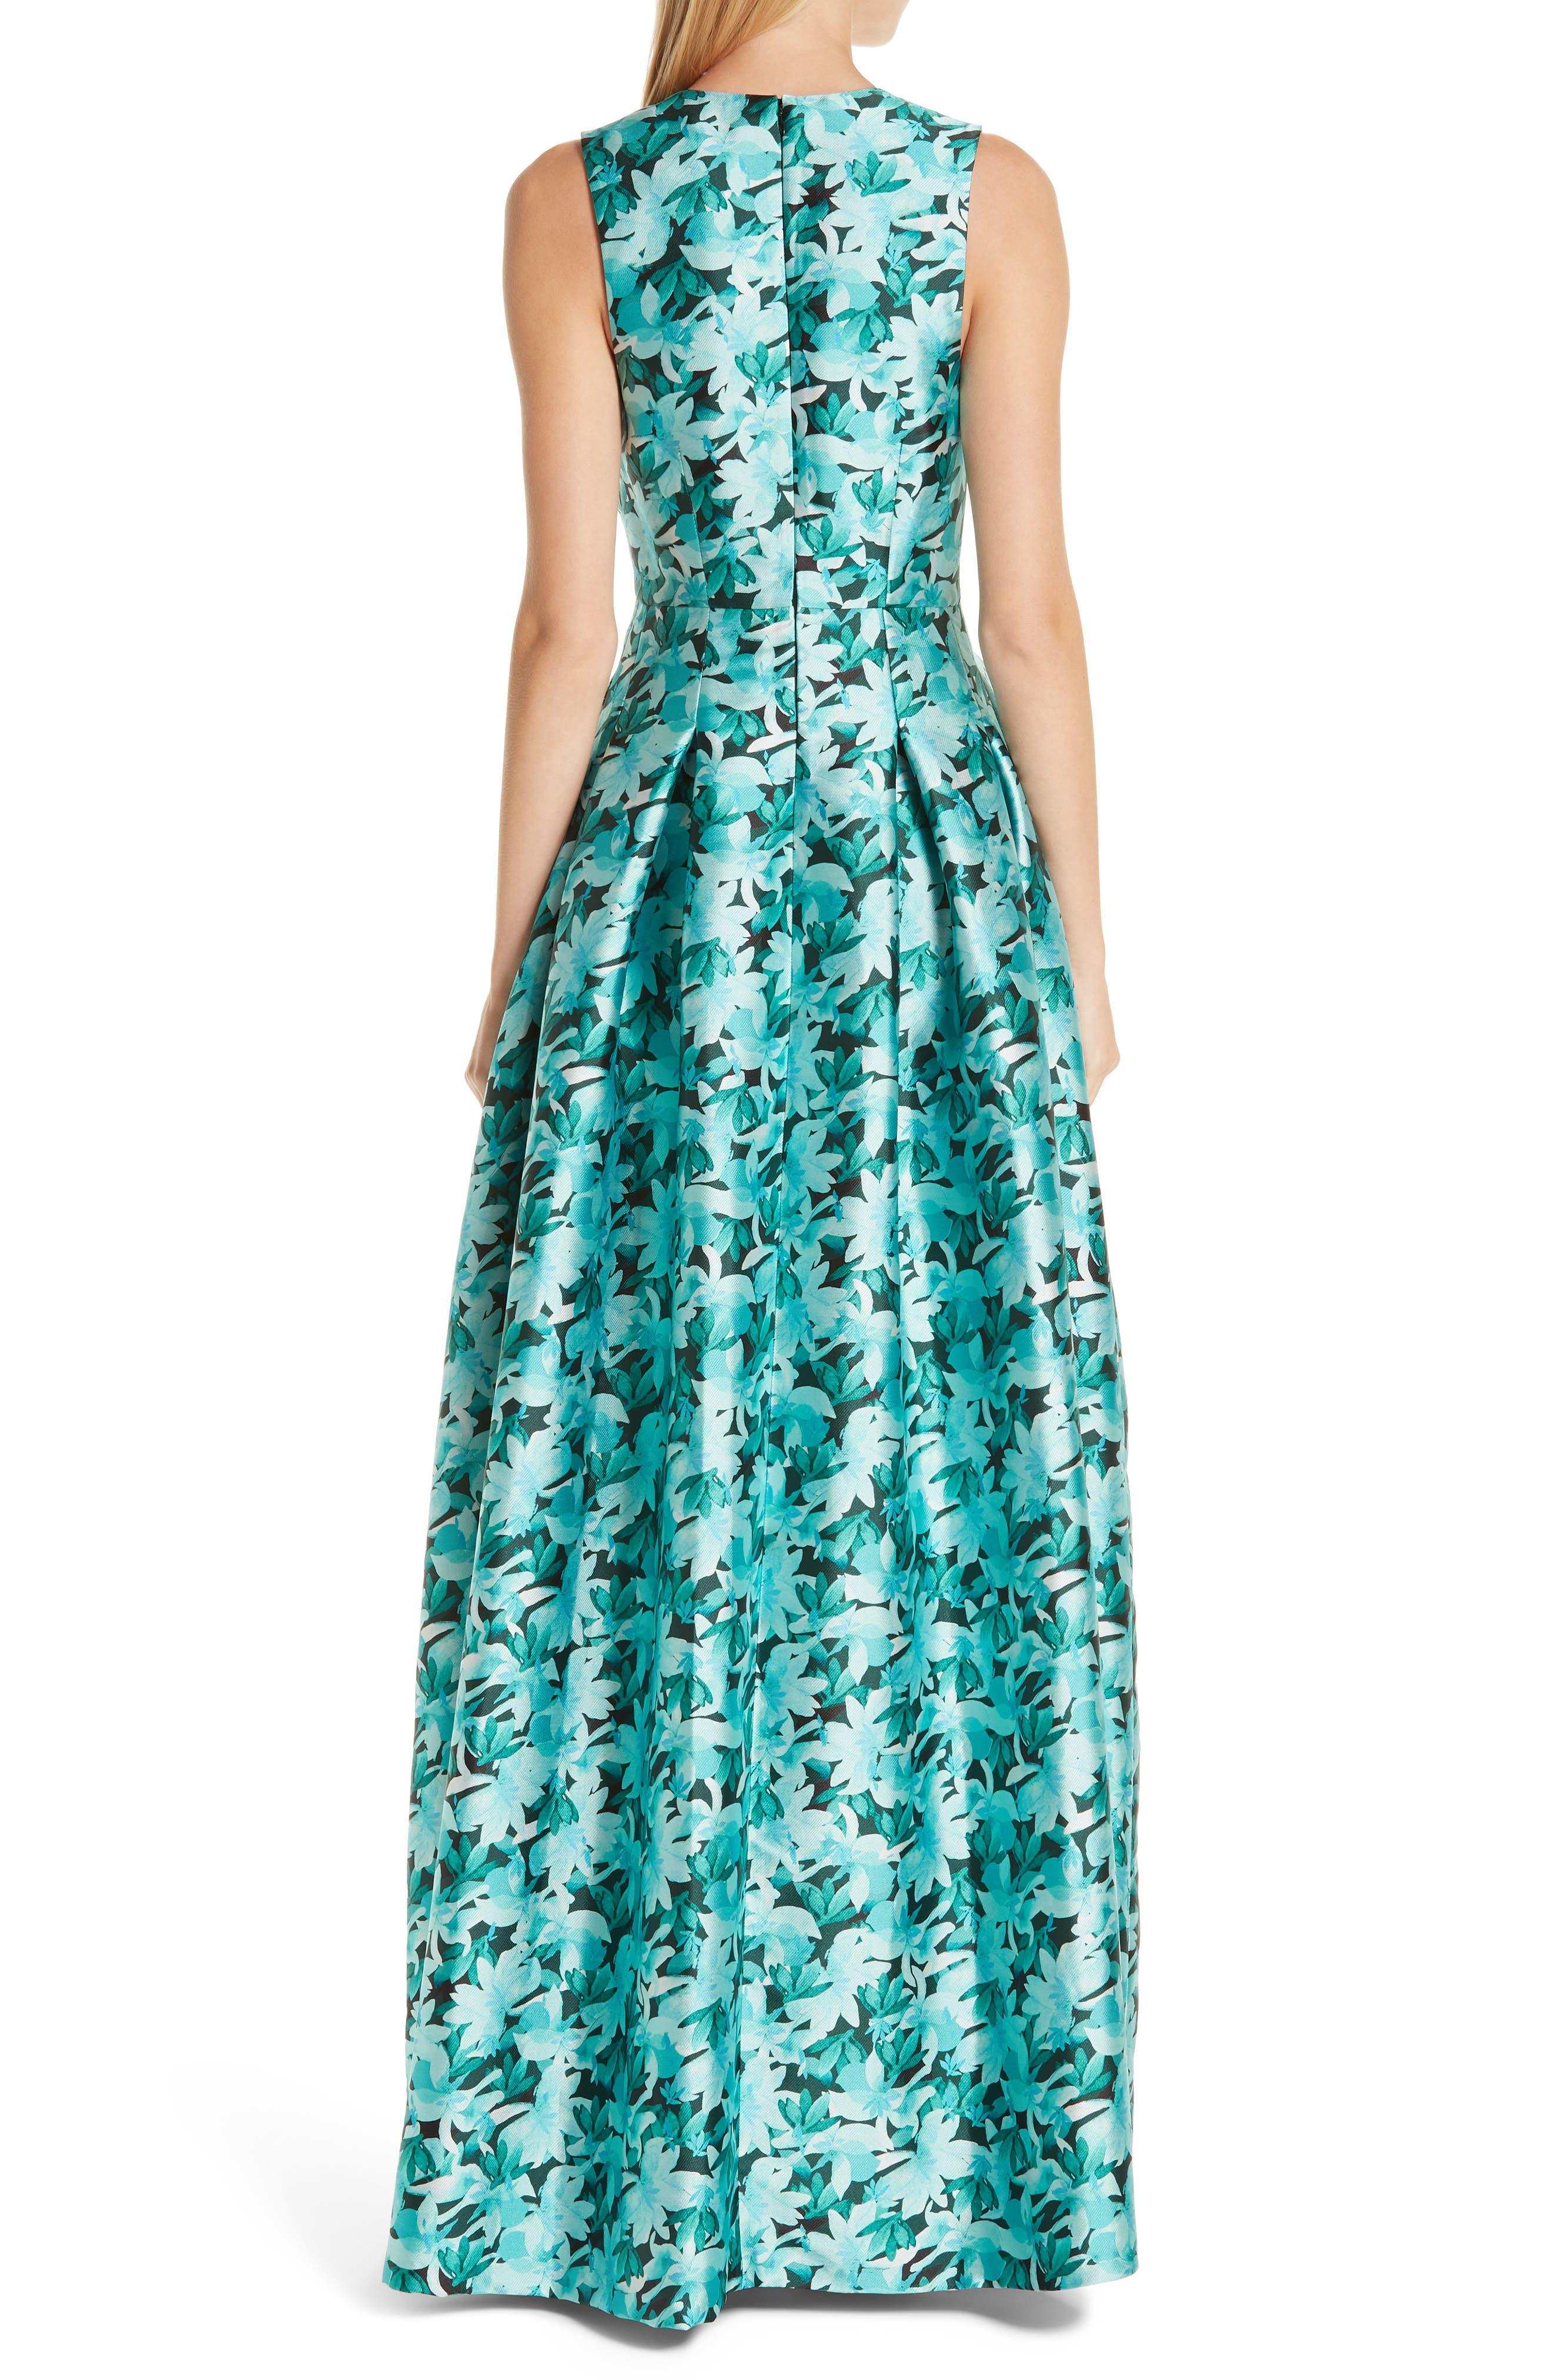 SACHIN & BABI, Brooke Floral Print Gown, Alternate thumbnail 2, color, TEAL